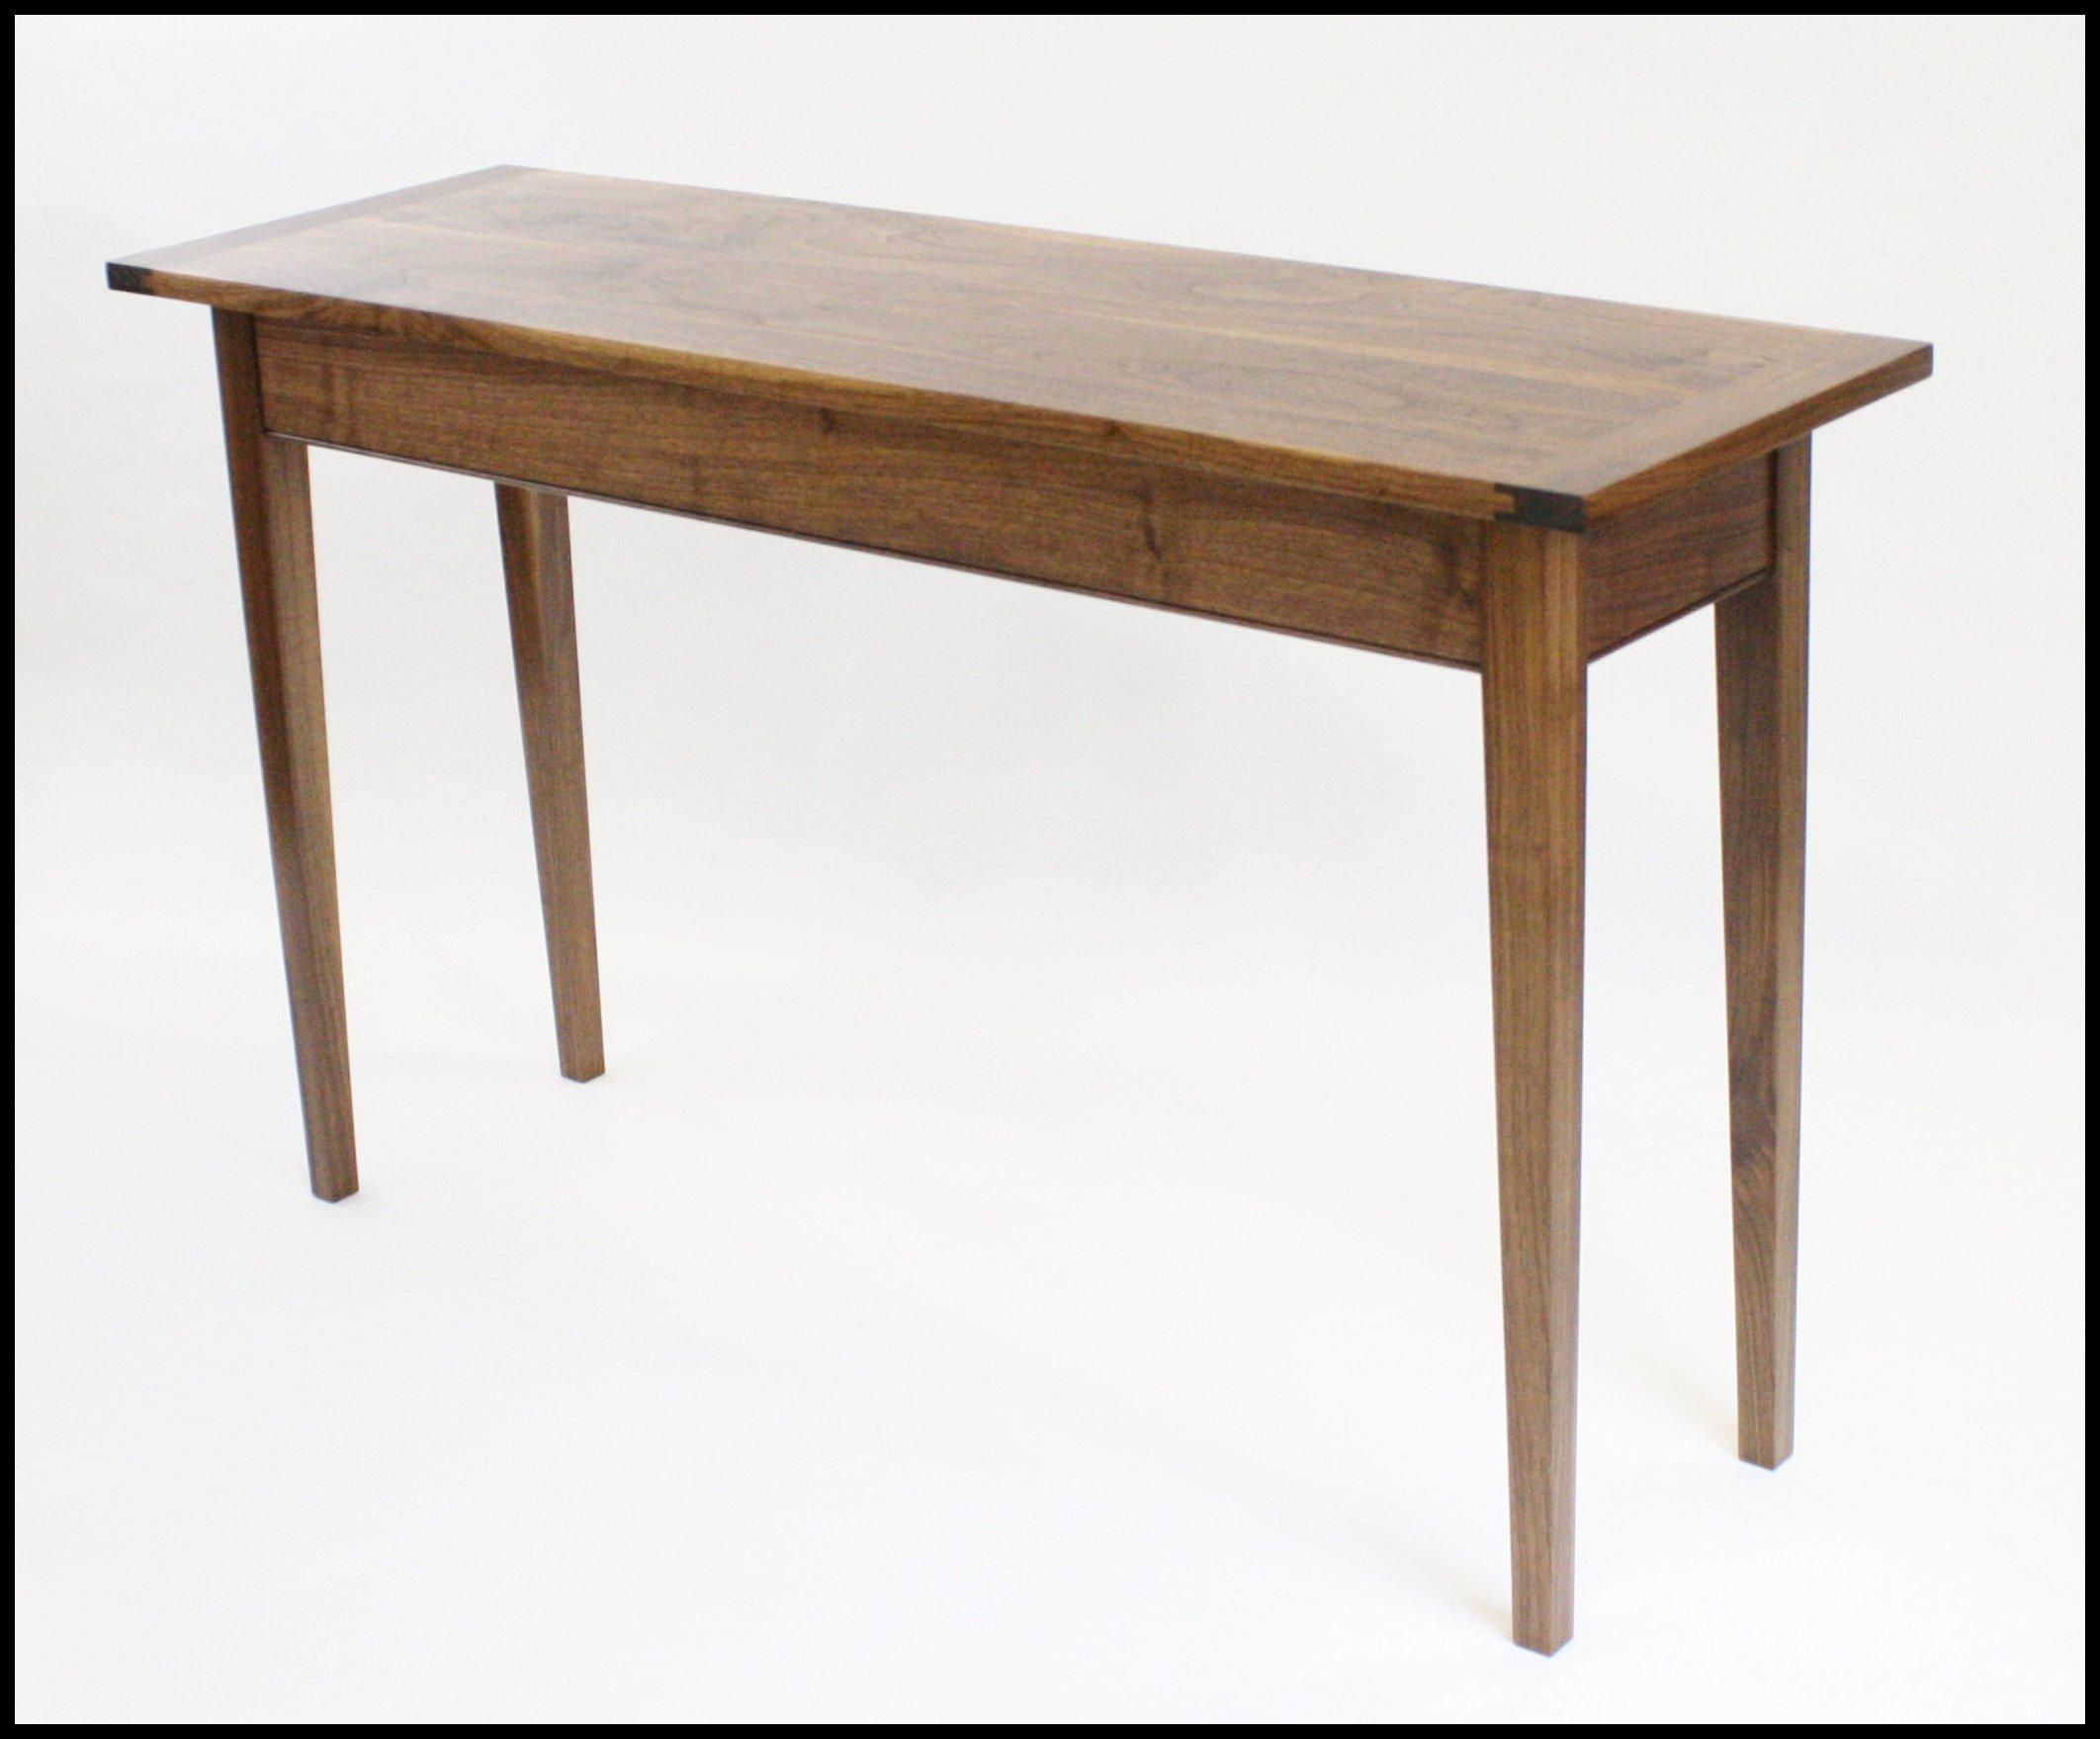 Custom Table with Secret Door Compartments  StashVault